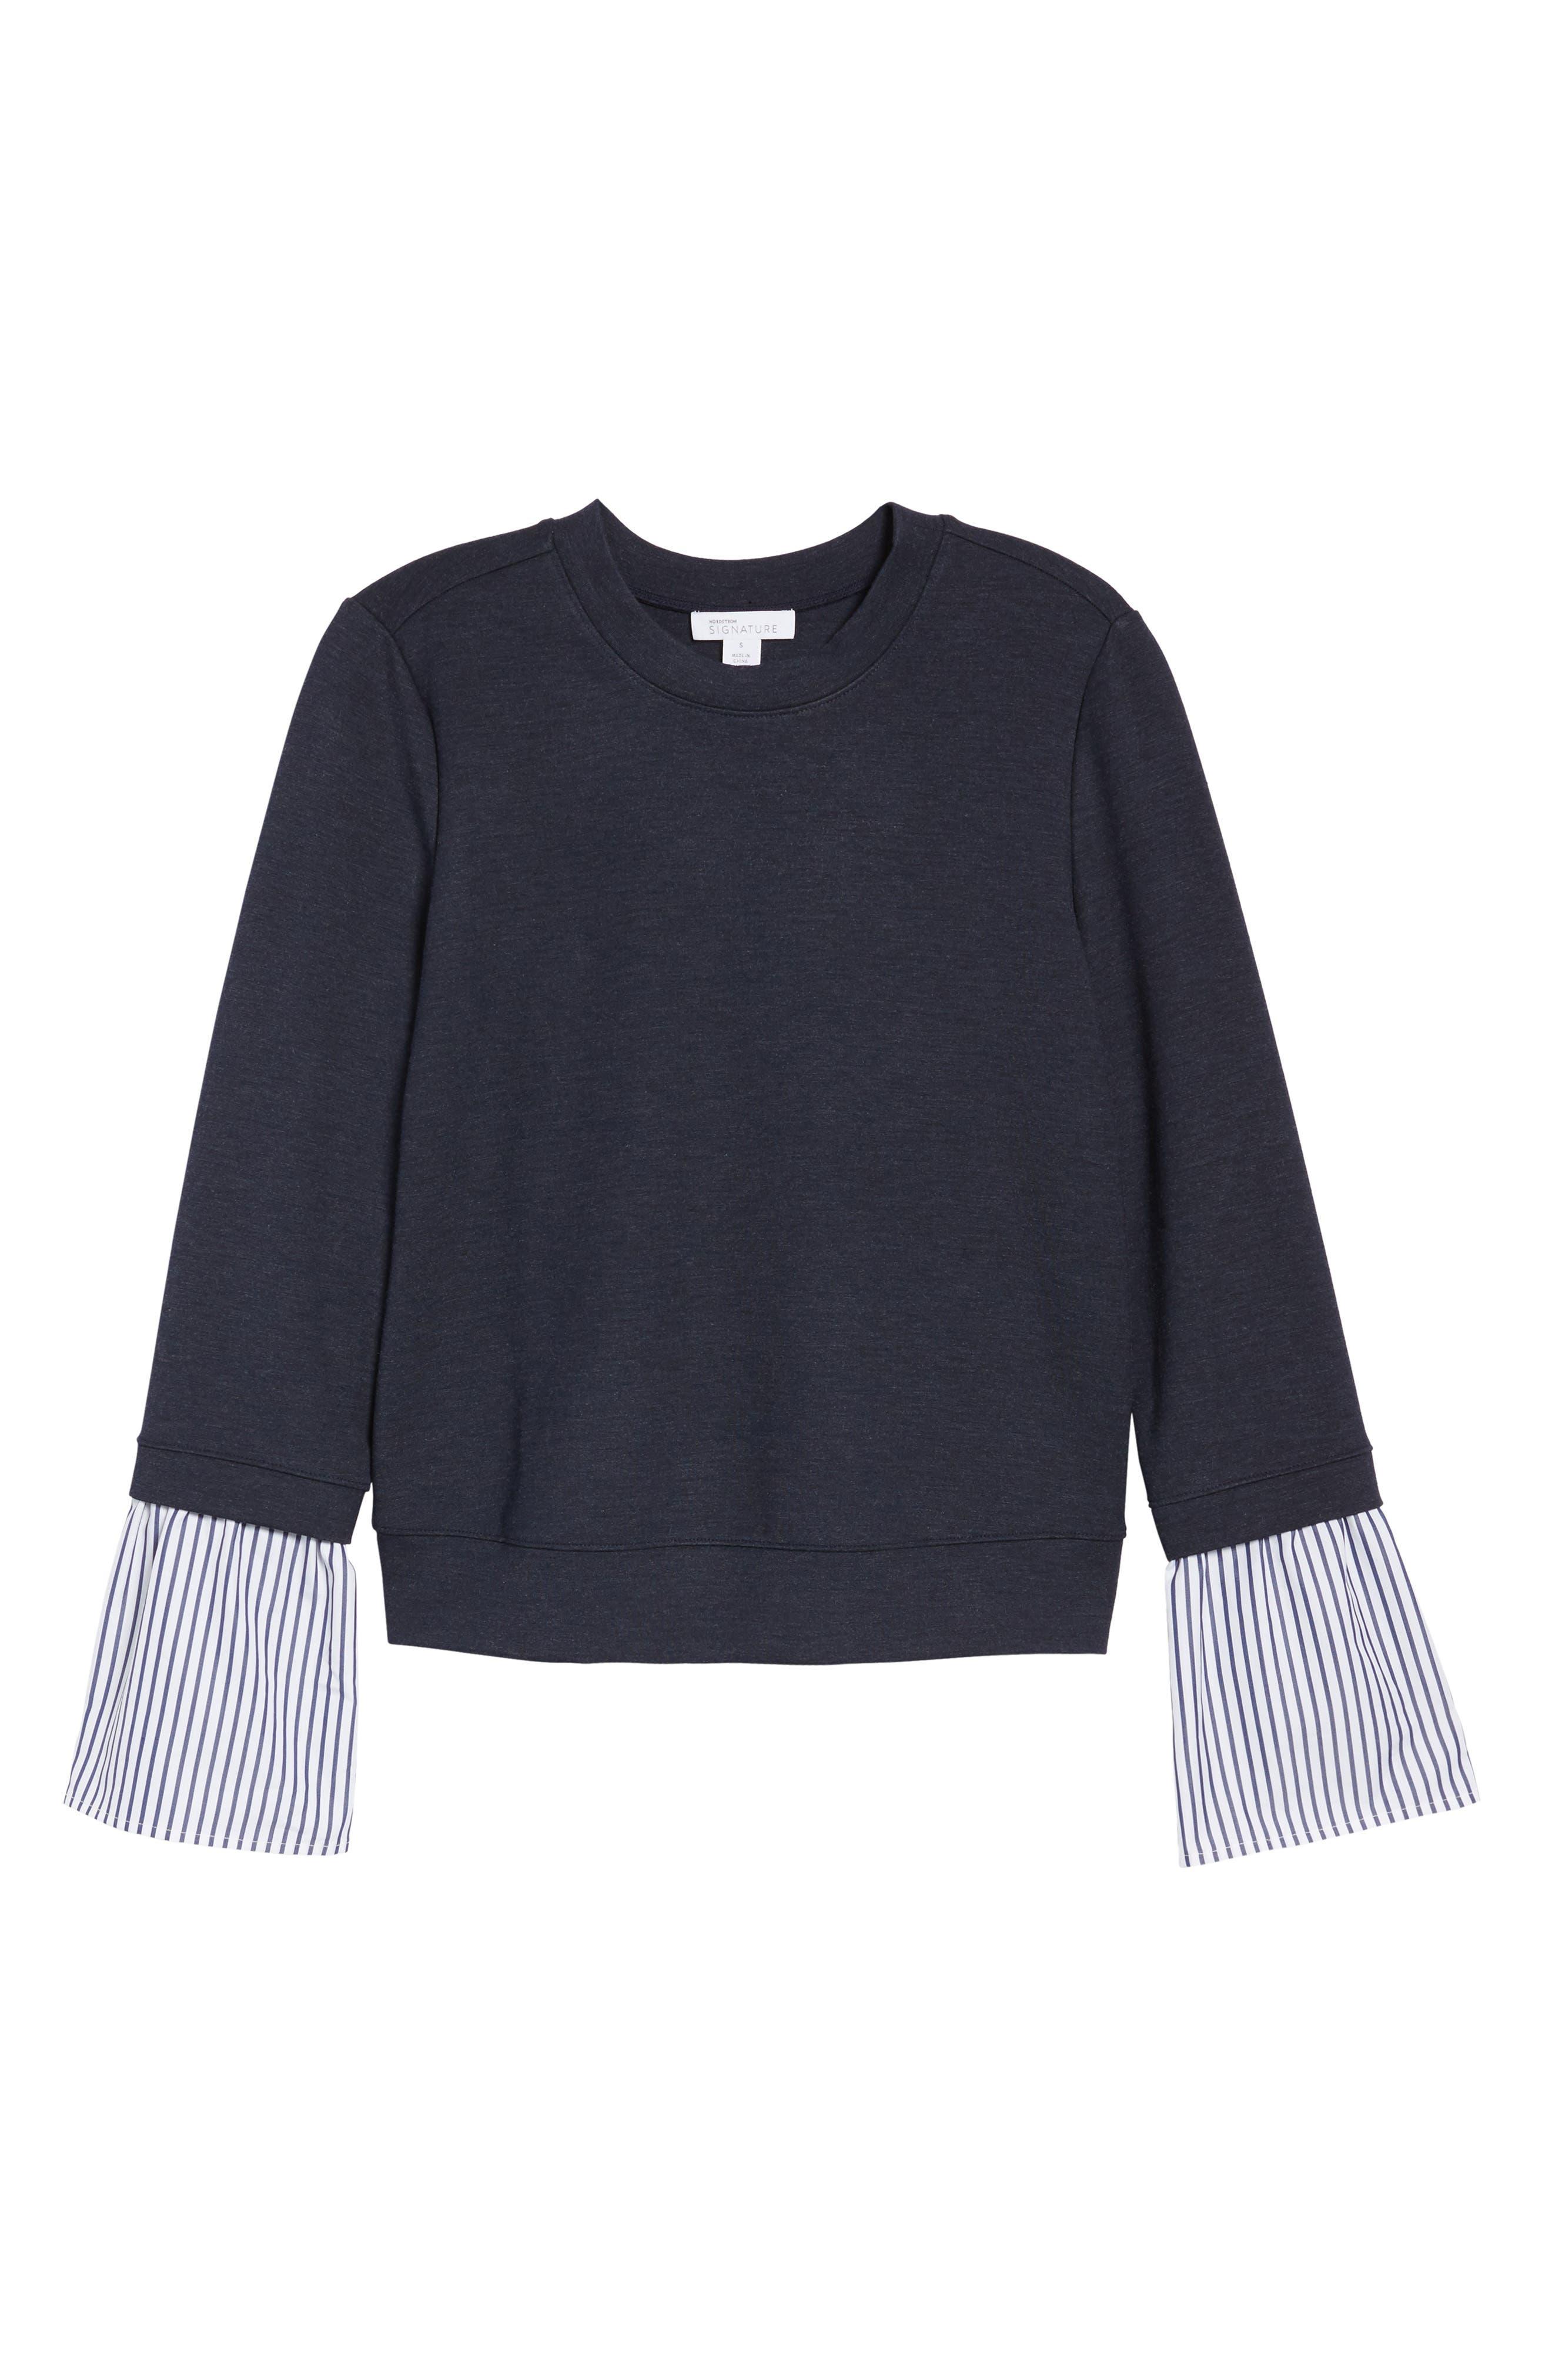 Poplin & Lace Crewneck Sweatshirt,                             Alternate thumbnail 6, color,                             410